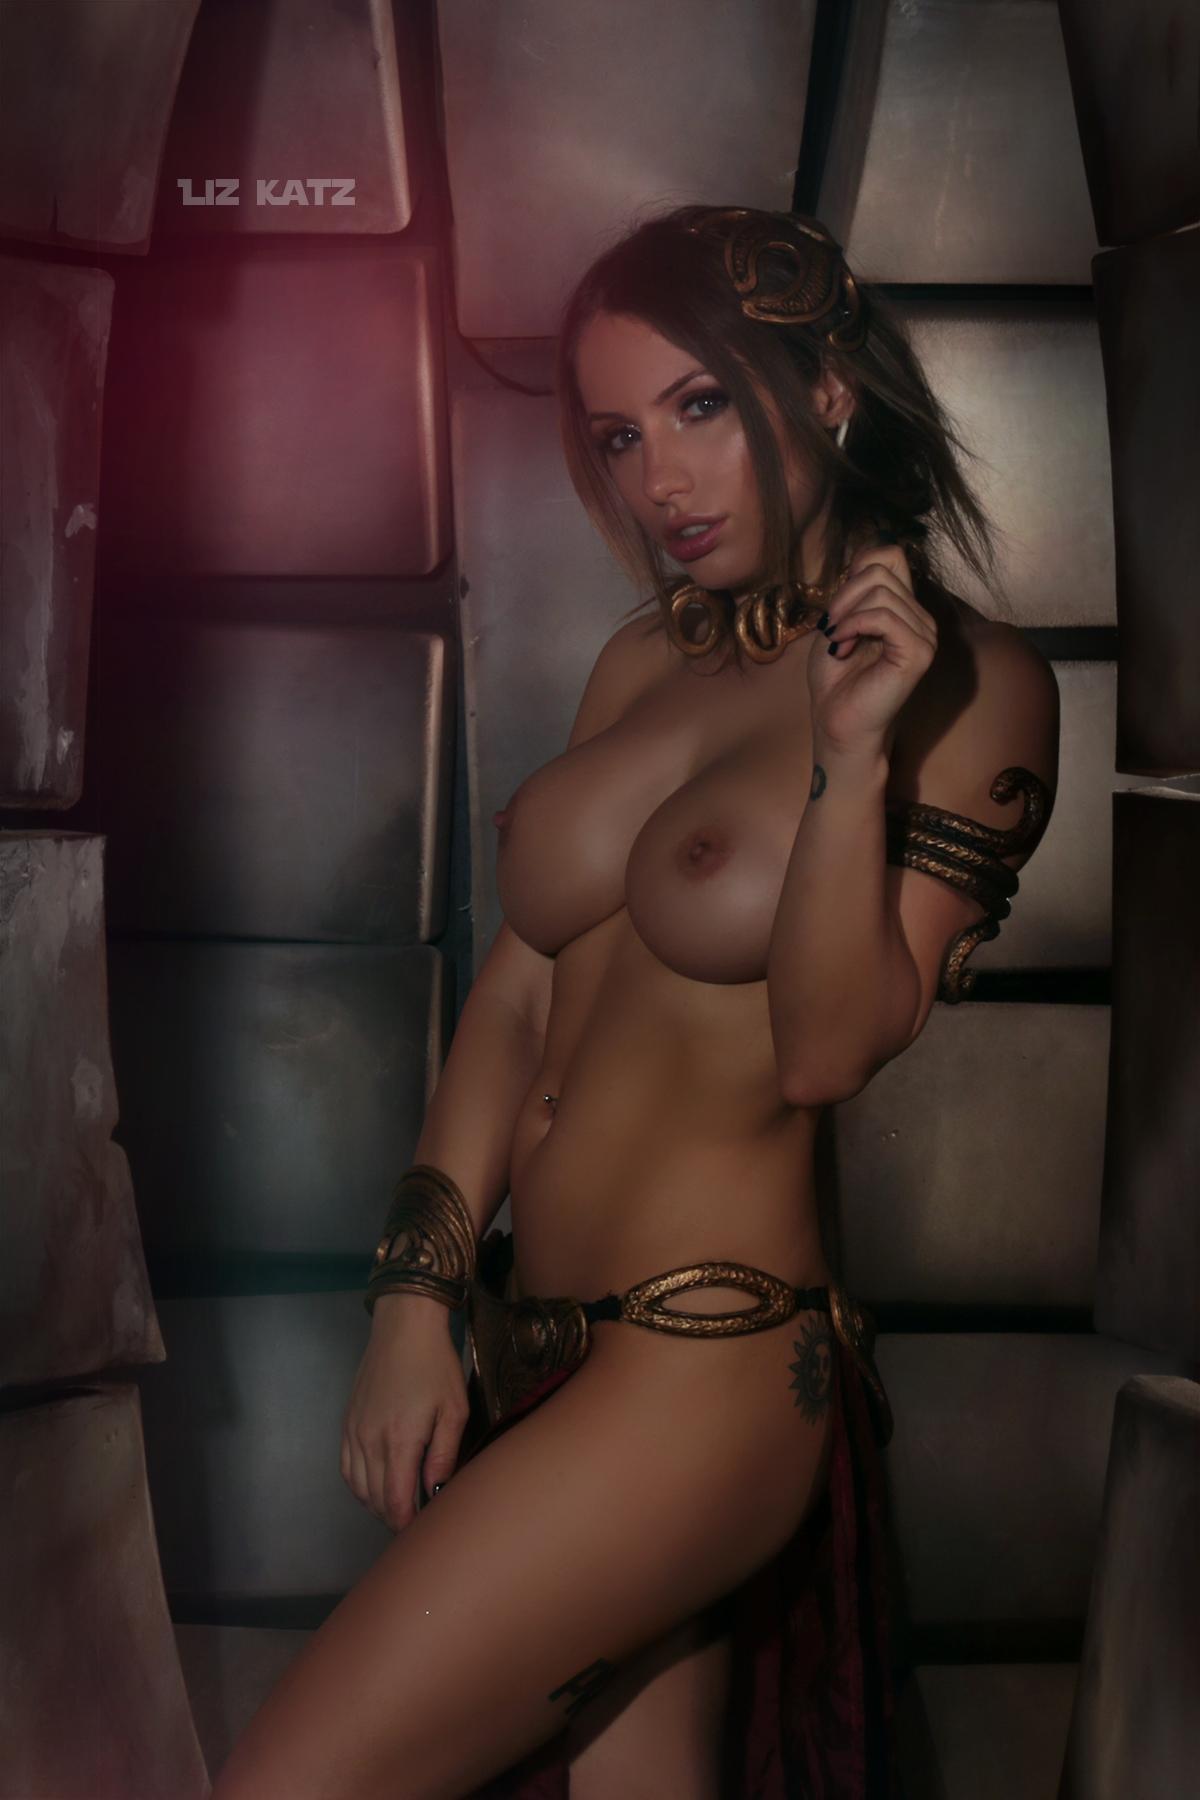 Liz Katz Slave Leia Nude Cosplay Onlyfans Leaked Photos 8